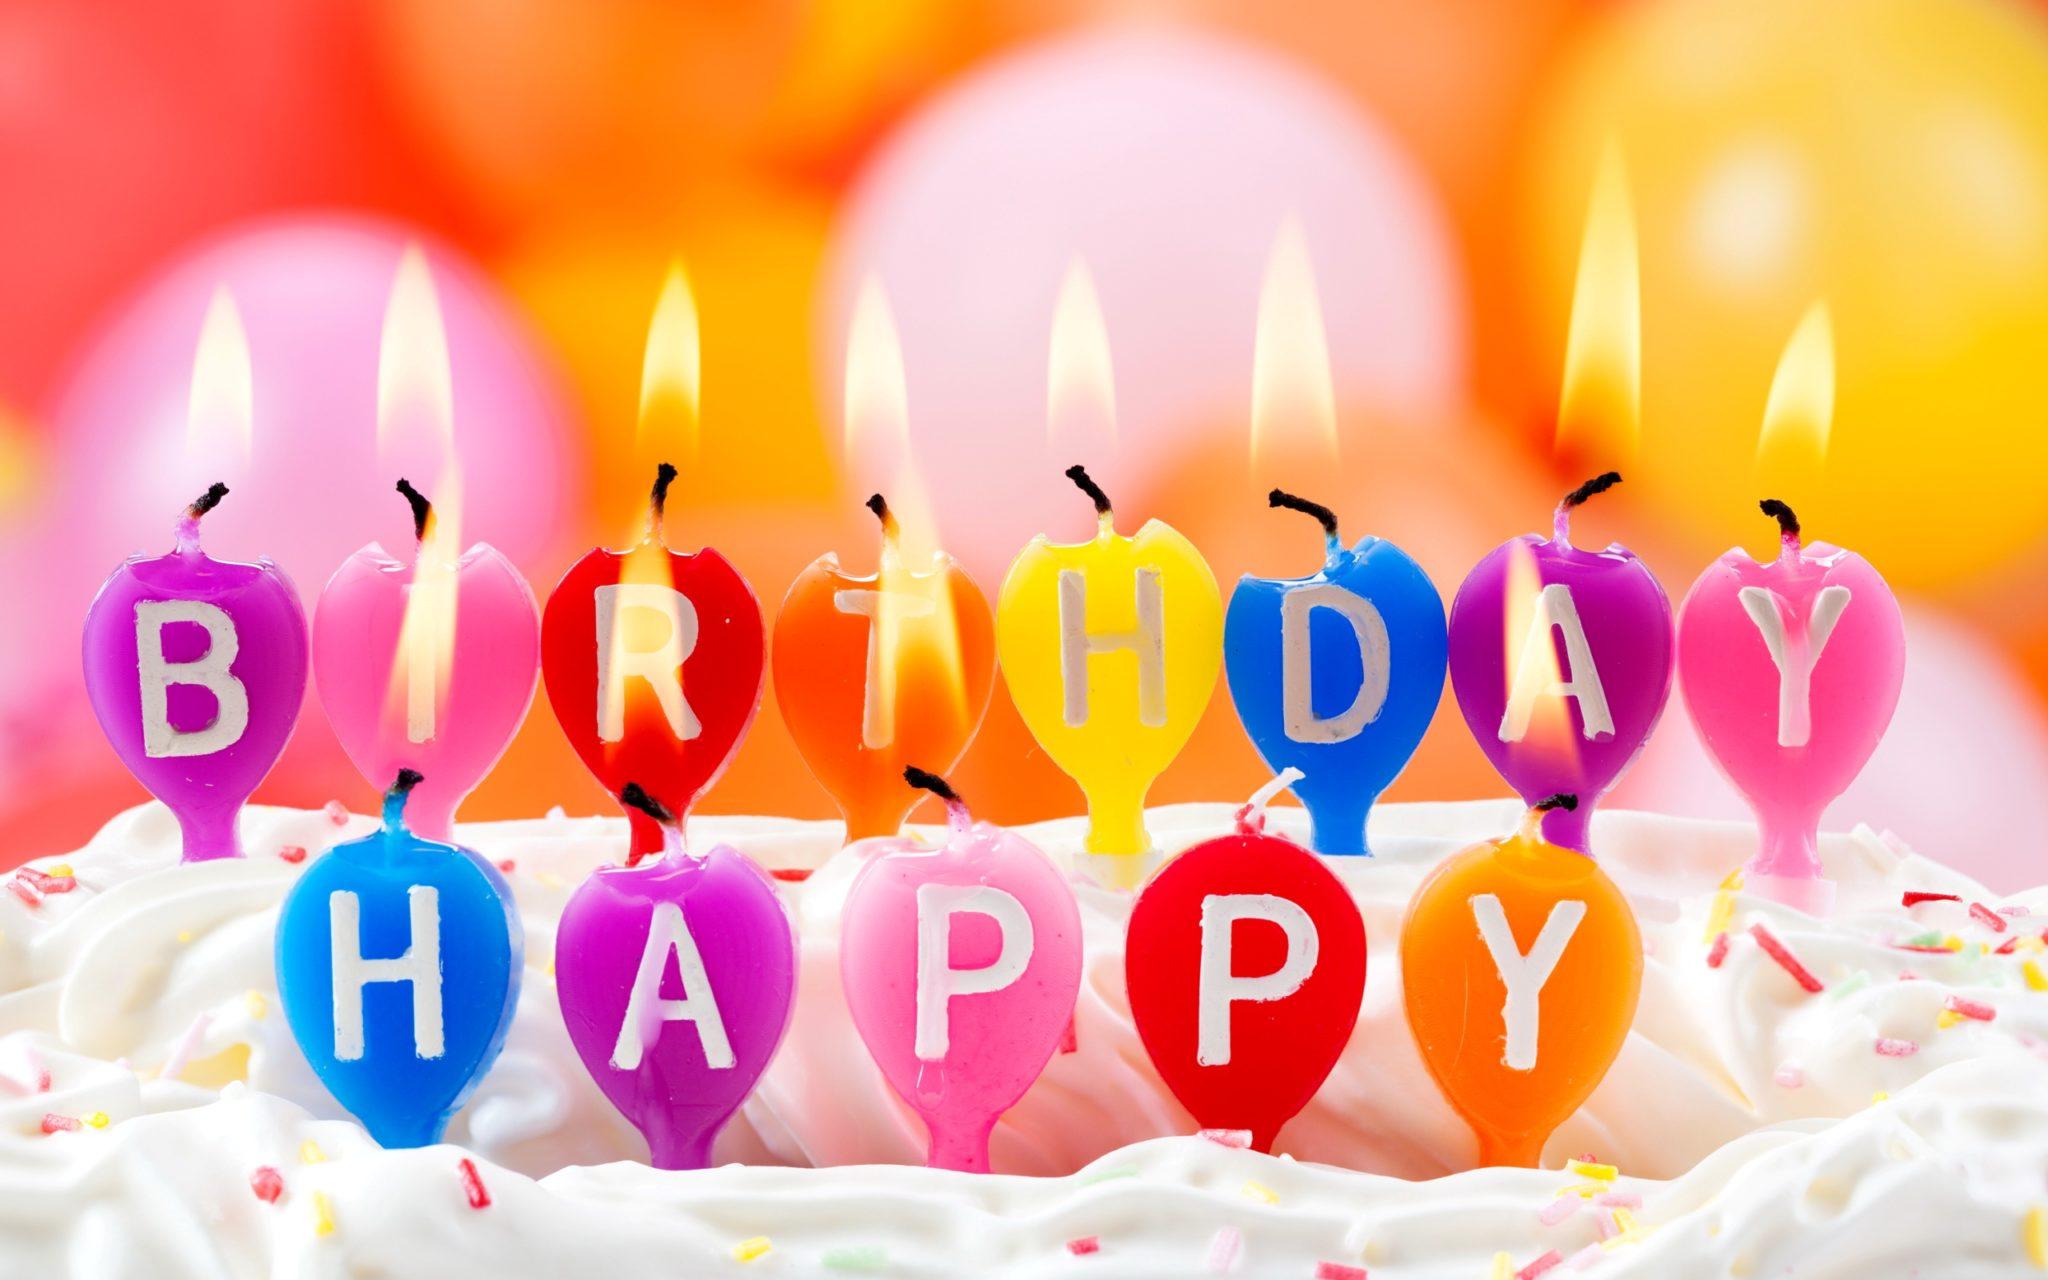 Happy Birthday Dear Friend Pravarsha Ode To A Friend Disqus